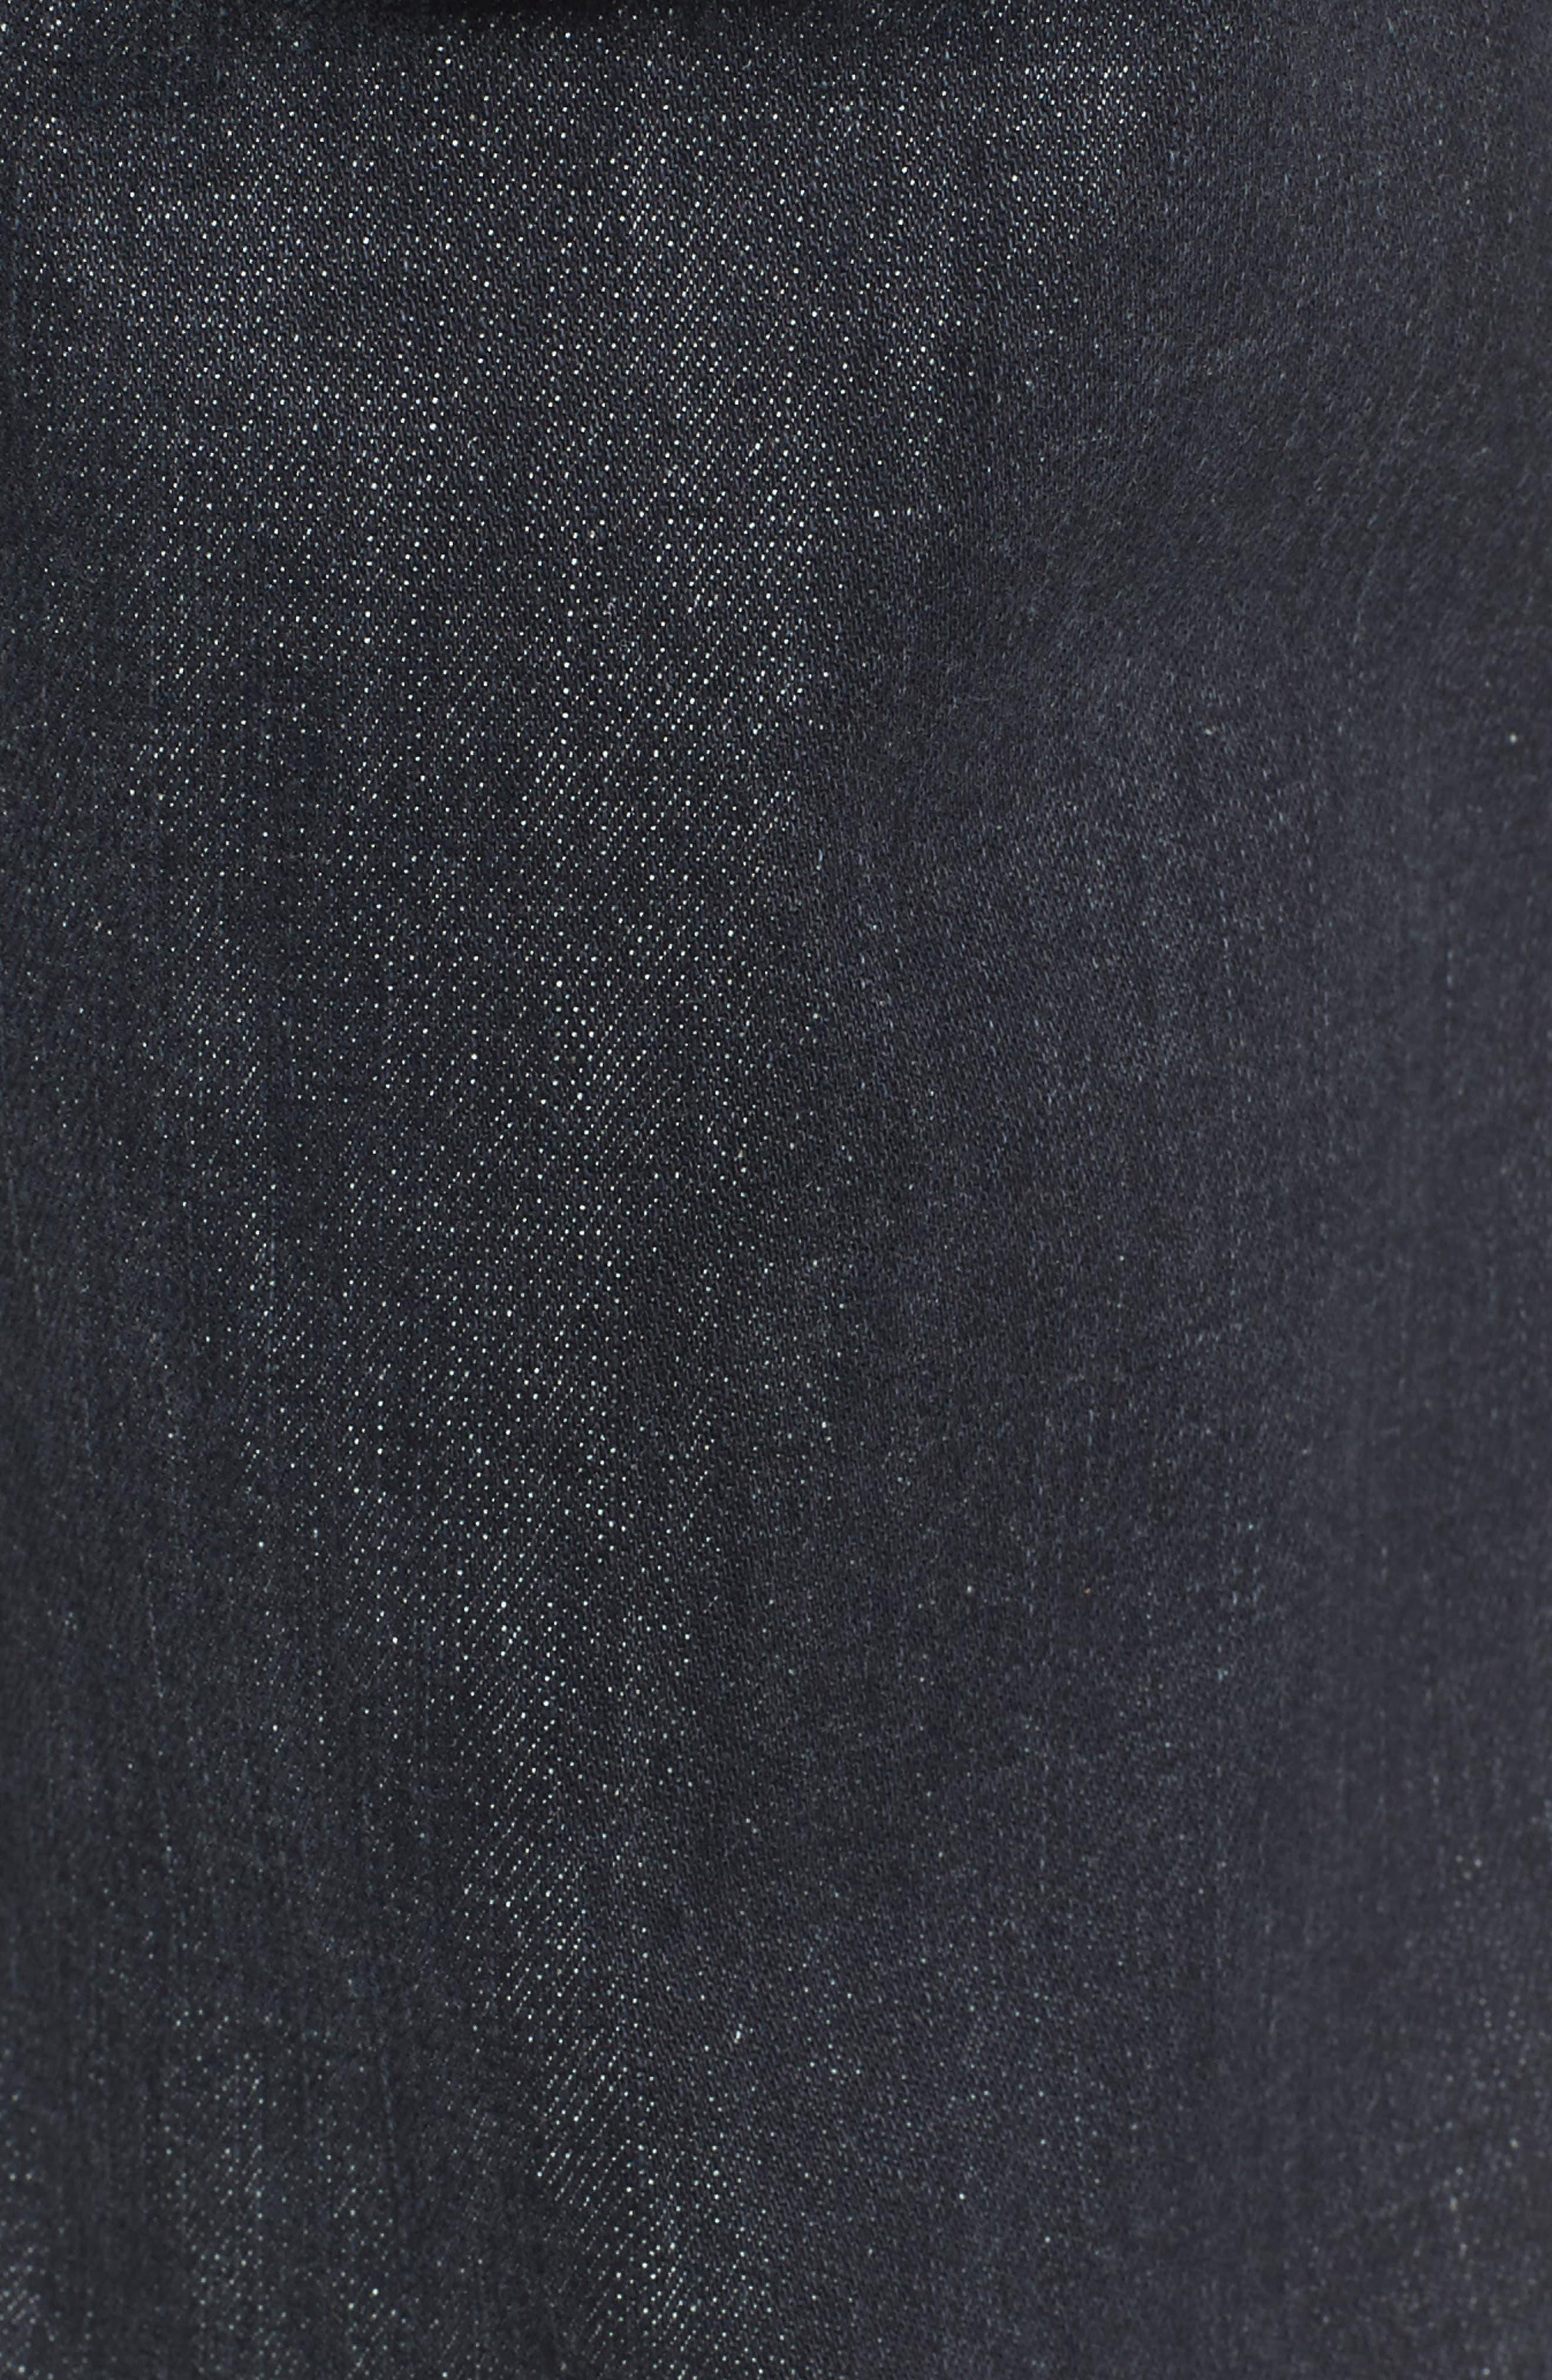 Blinder Skinny Fit Moto Jeans,                             Alternate thumbnail 5, color,                             Sparring 2